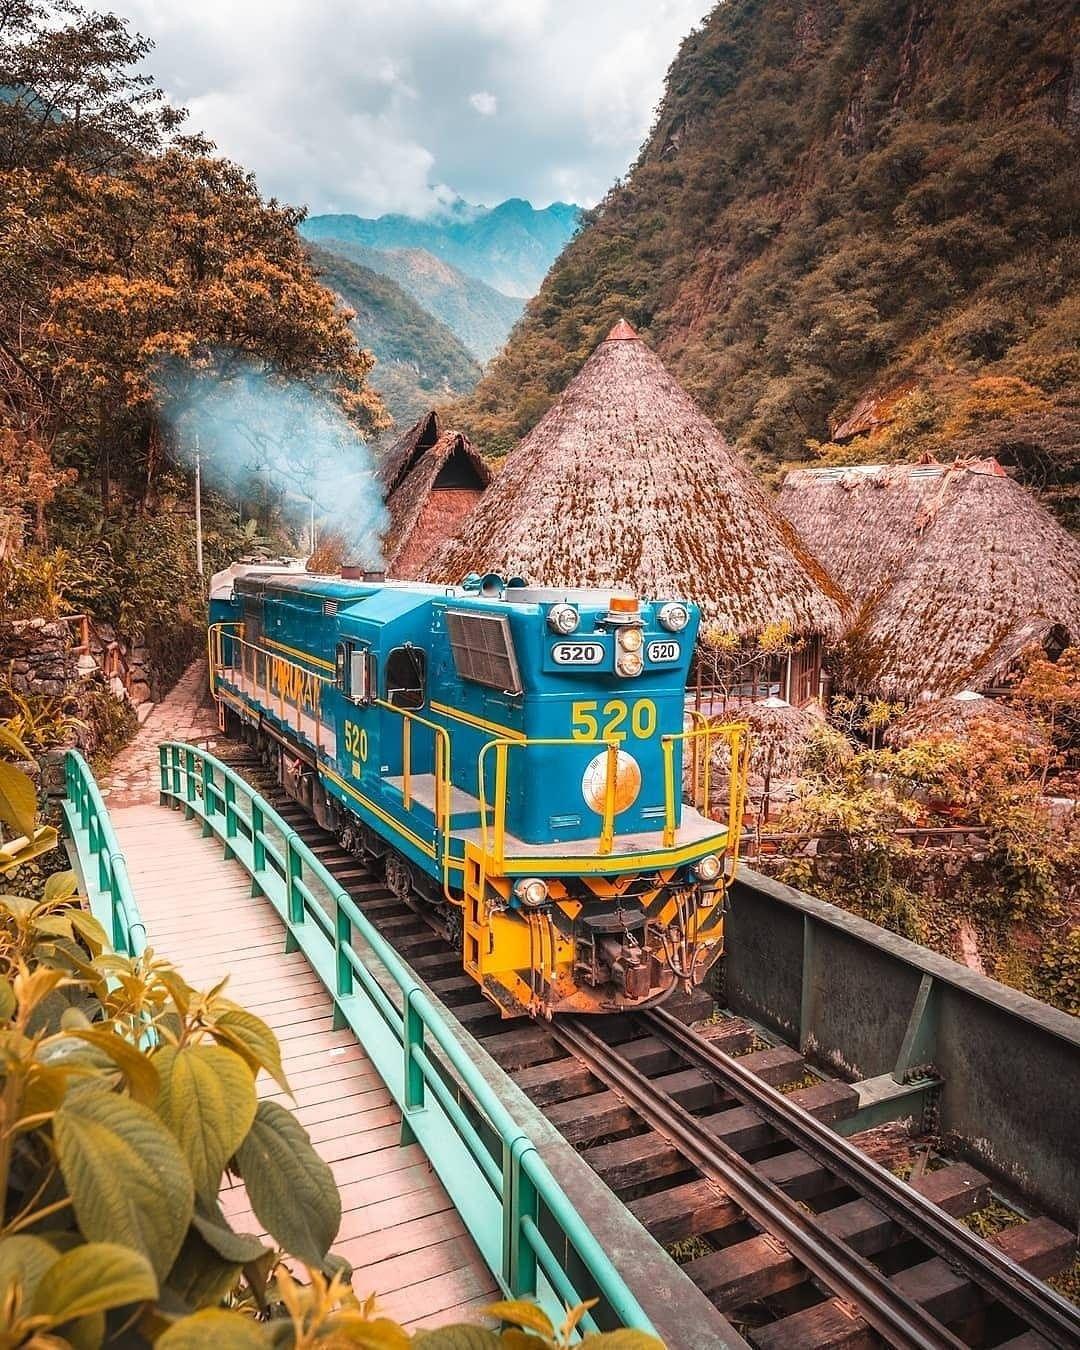 Viaje en tren a machu picchu